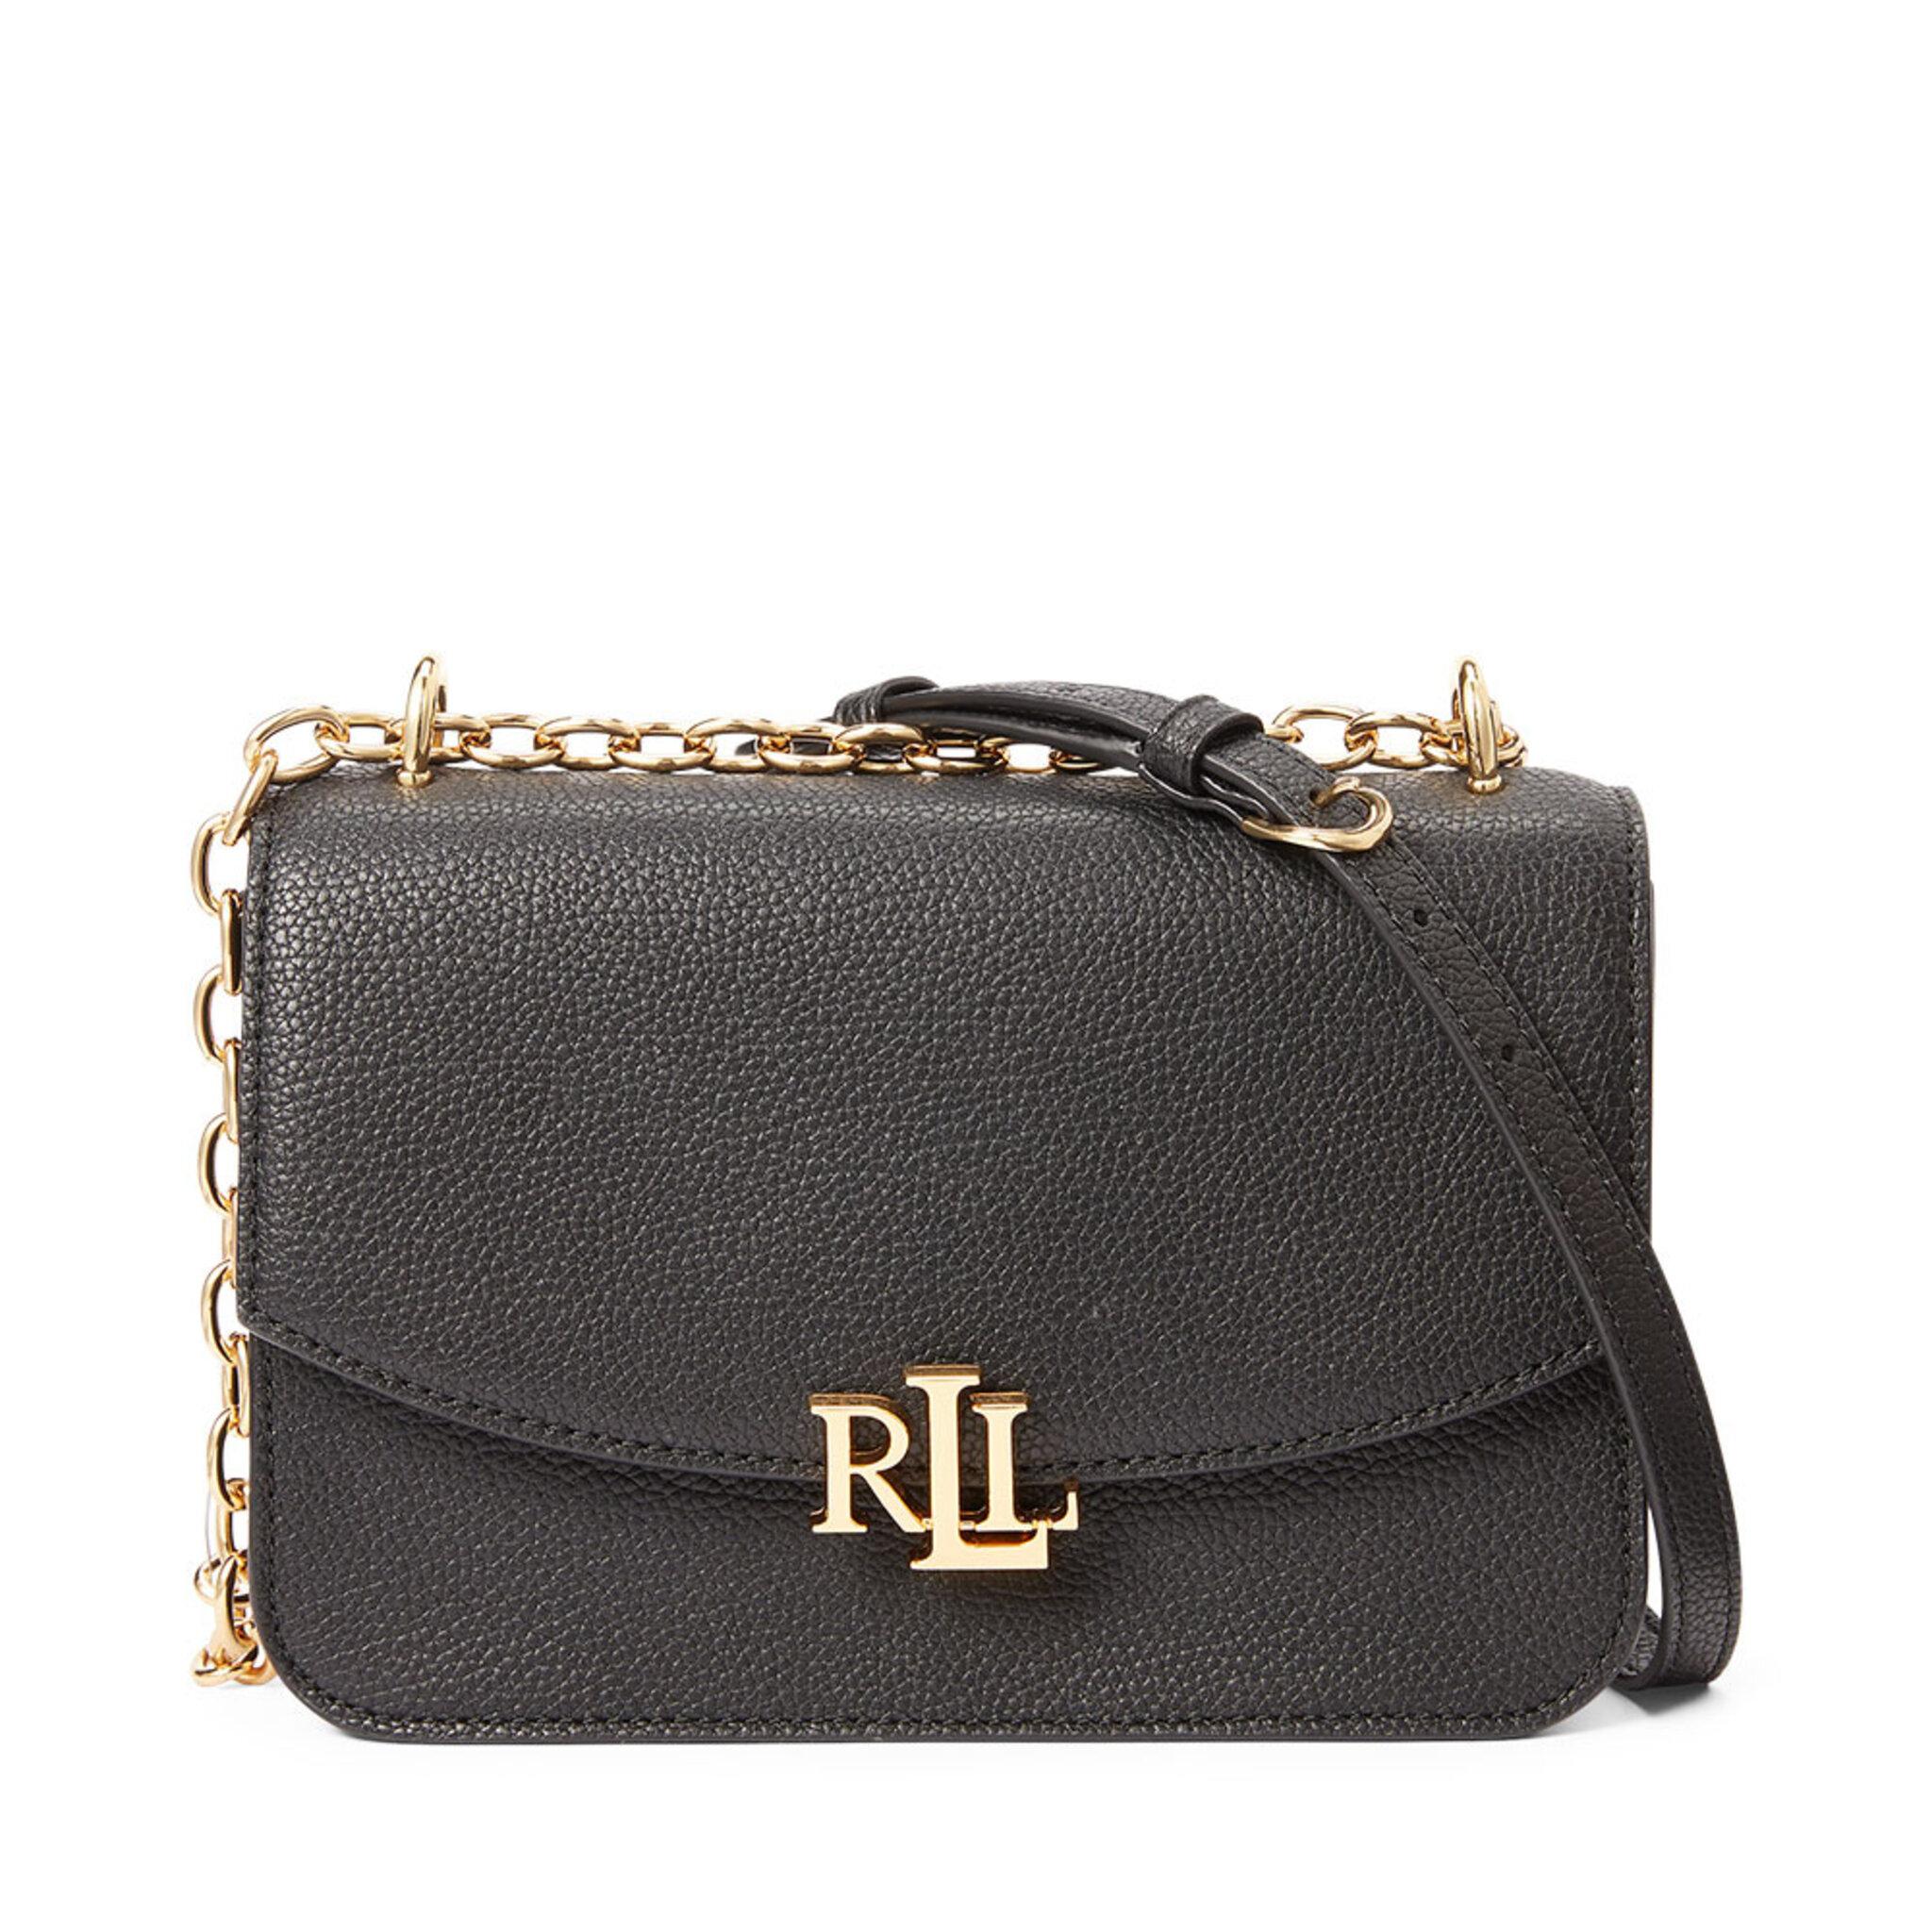 Medium Leather Crossbody Bag, ONE SIZE